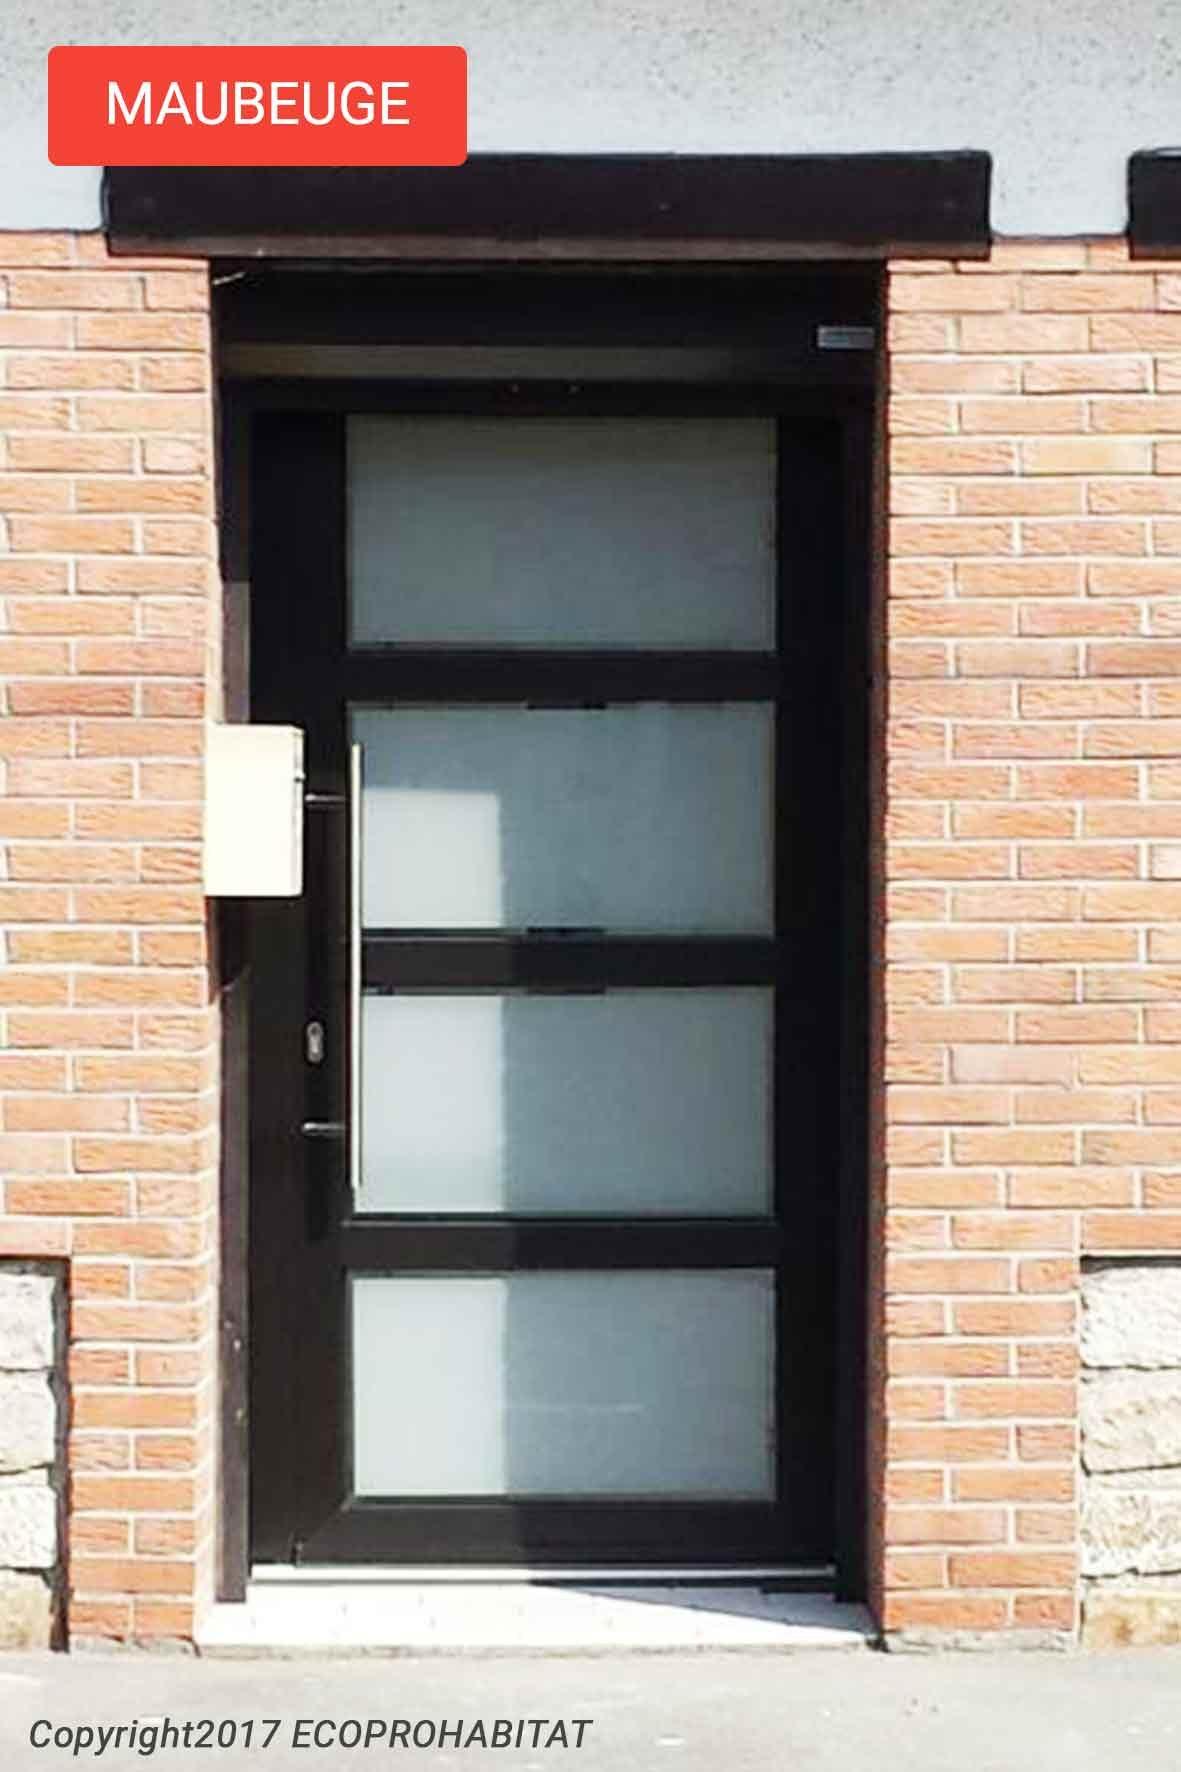 ecoprohabitat-porte-maubeuge-583